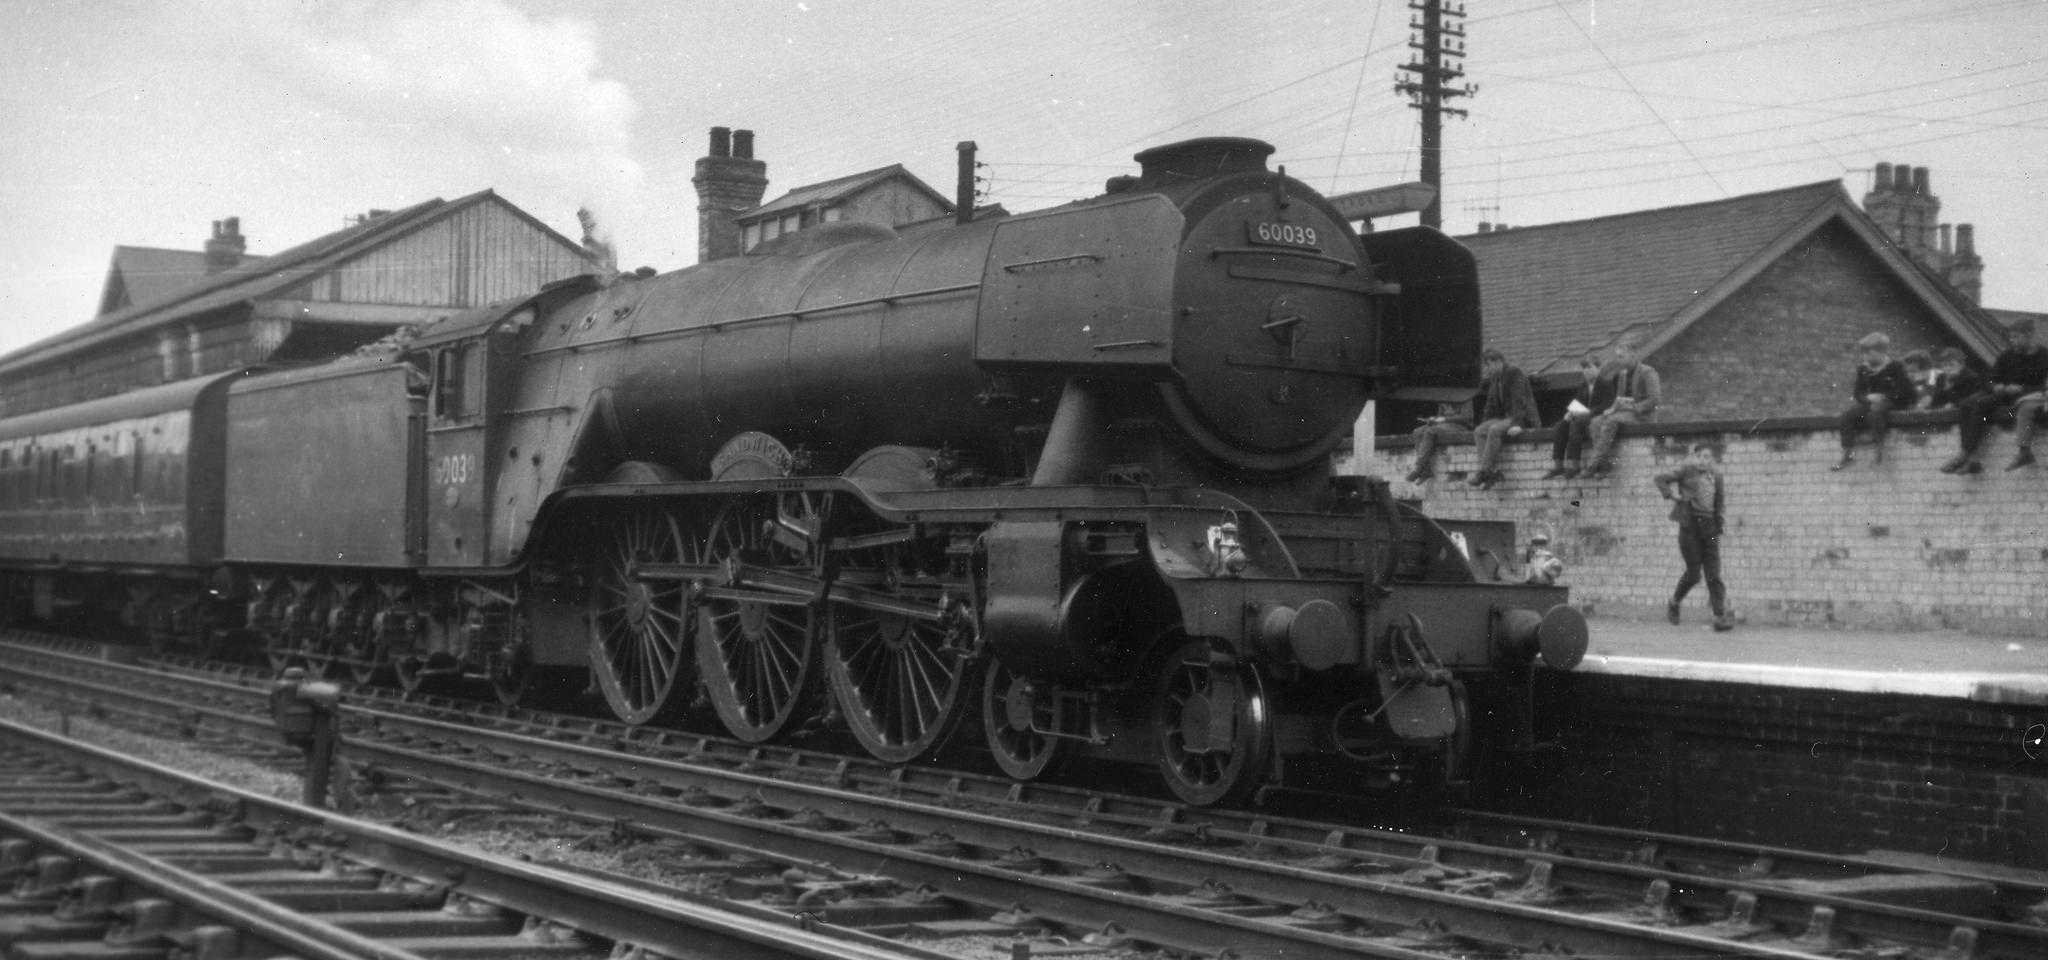 That S Me On The Wall Live Steam Locomotive Steam Engine Trains Steam Railway